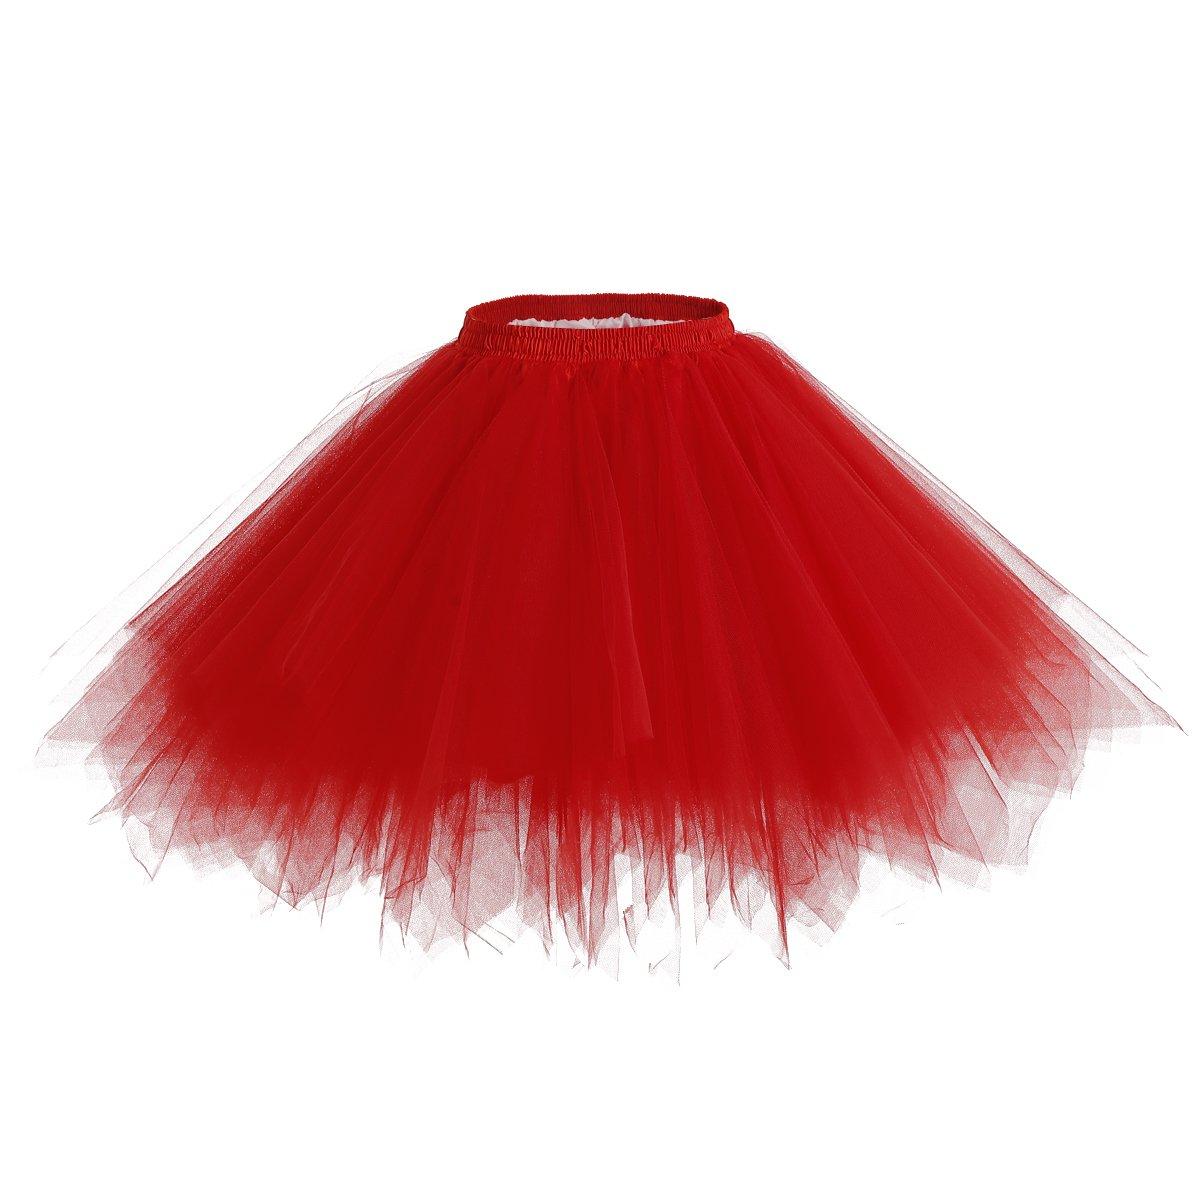 Bridesmay Women's Short Party Tutu Ballet Bubble Skirt Retro Petticoat Skirt